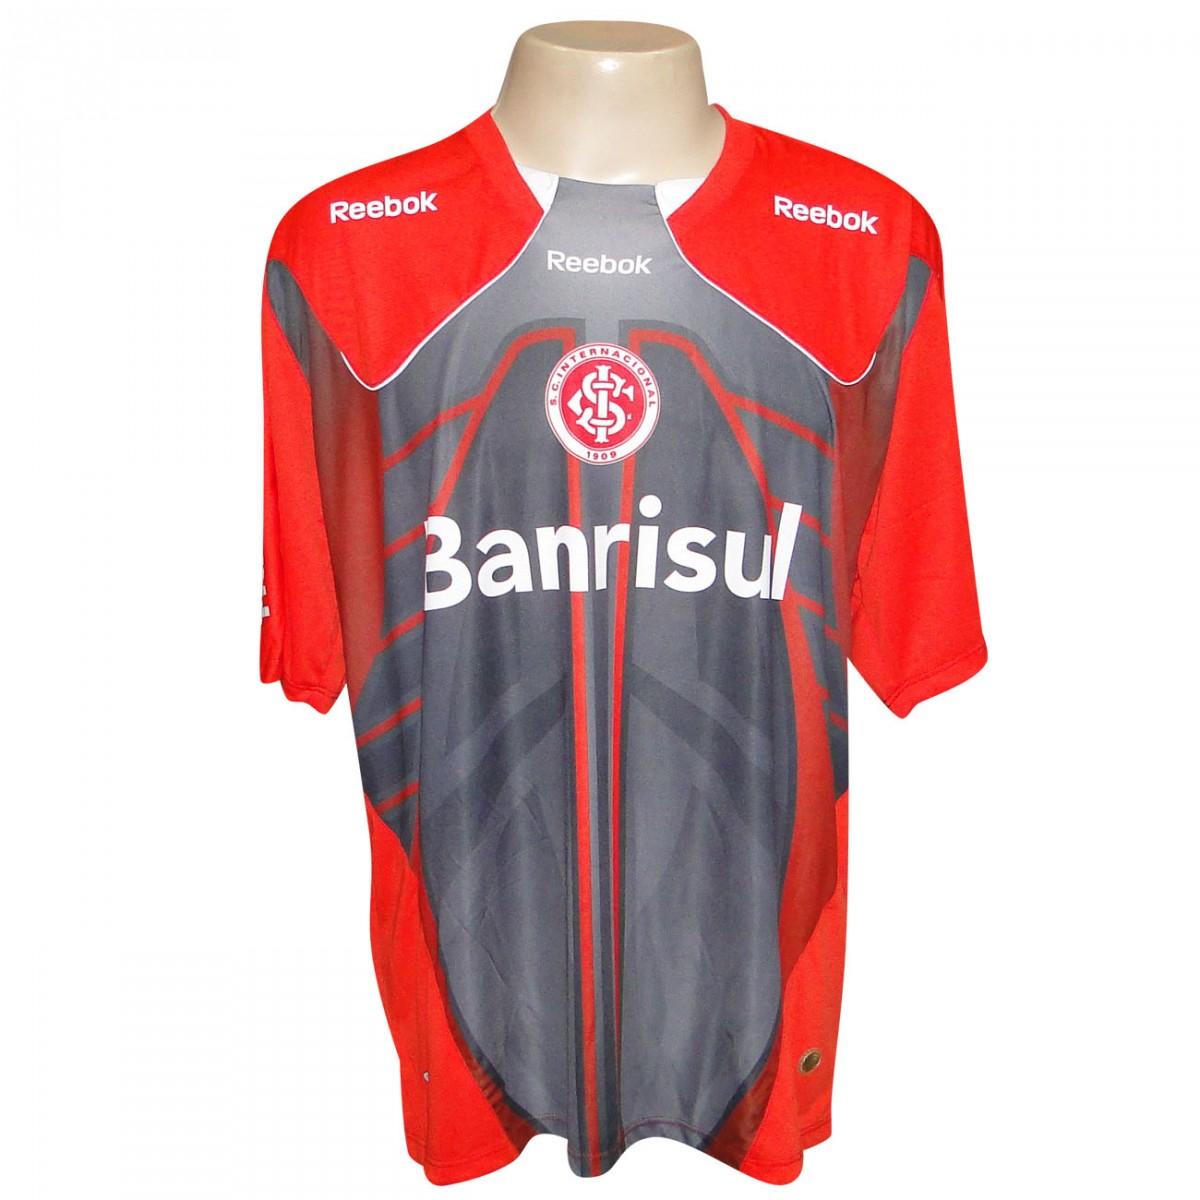 1dac78501f Camisa Inter Reebok Treino 2010 2011 IN06012V - VERMELHO CINZA ...